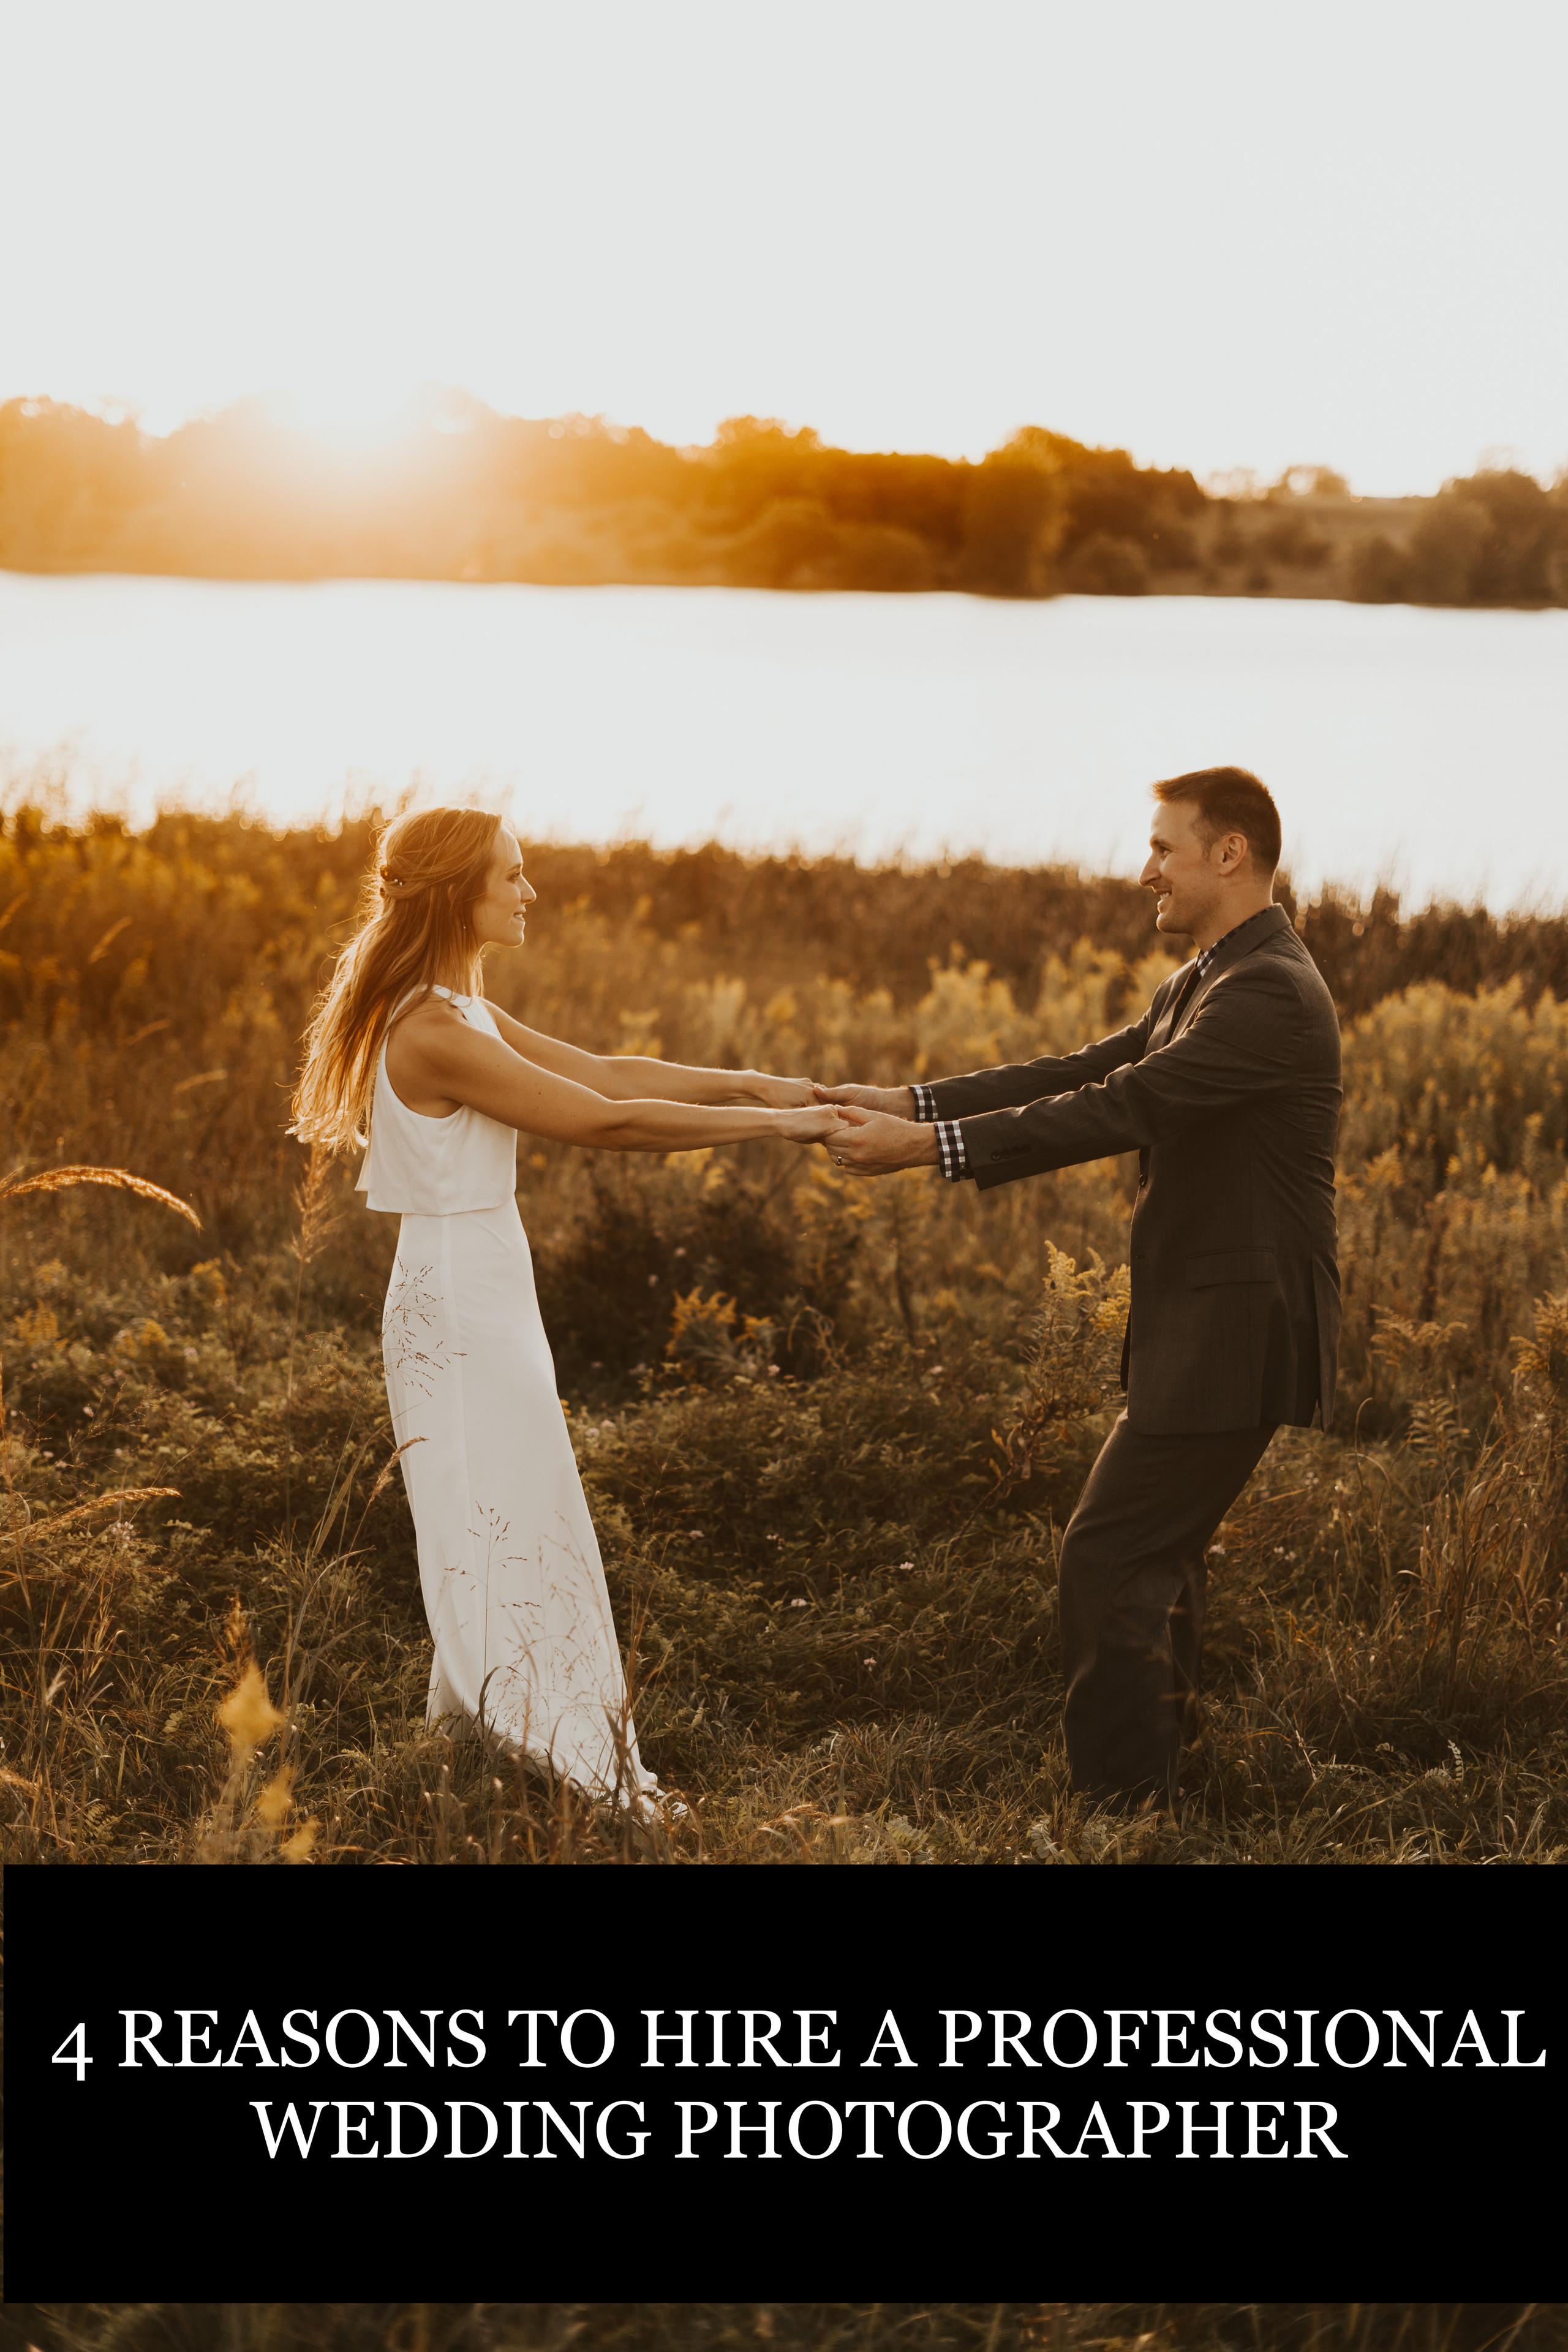 should I hire a professional wedding photographer